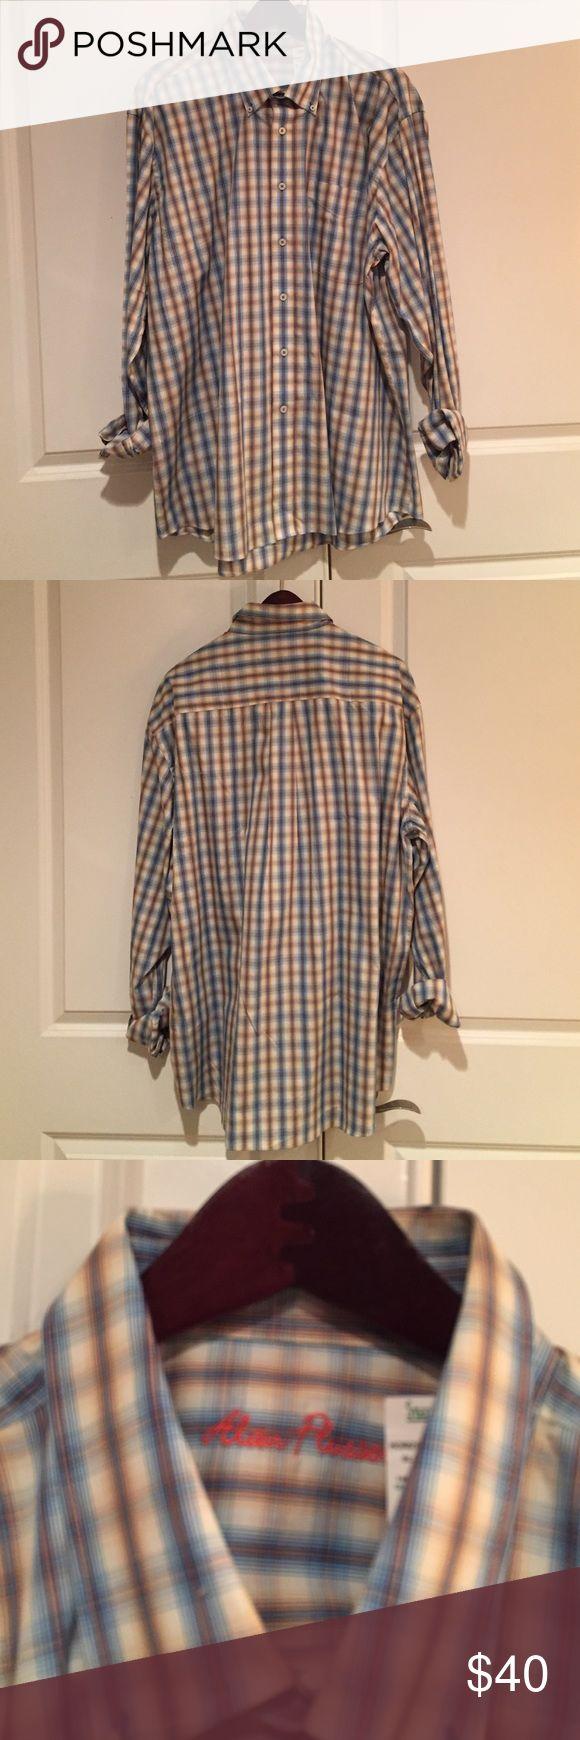 Alan Flusser men's plaid shirt Plaid shirt. Can be dressed up or down. Button down. 100% cotton. alan flusser Shirts Casual Button Down Shirts